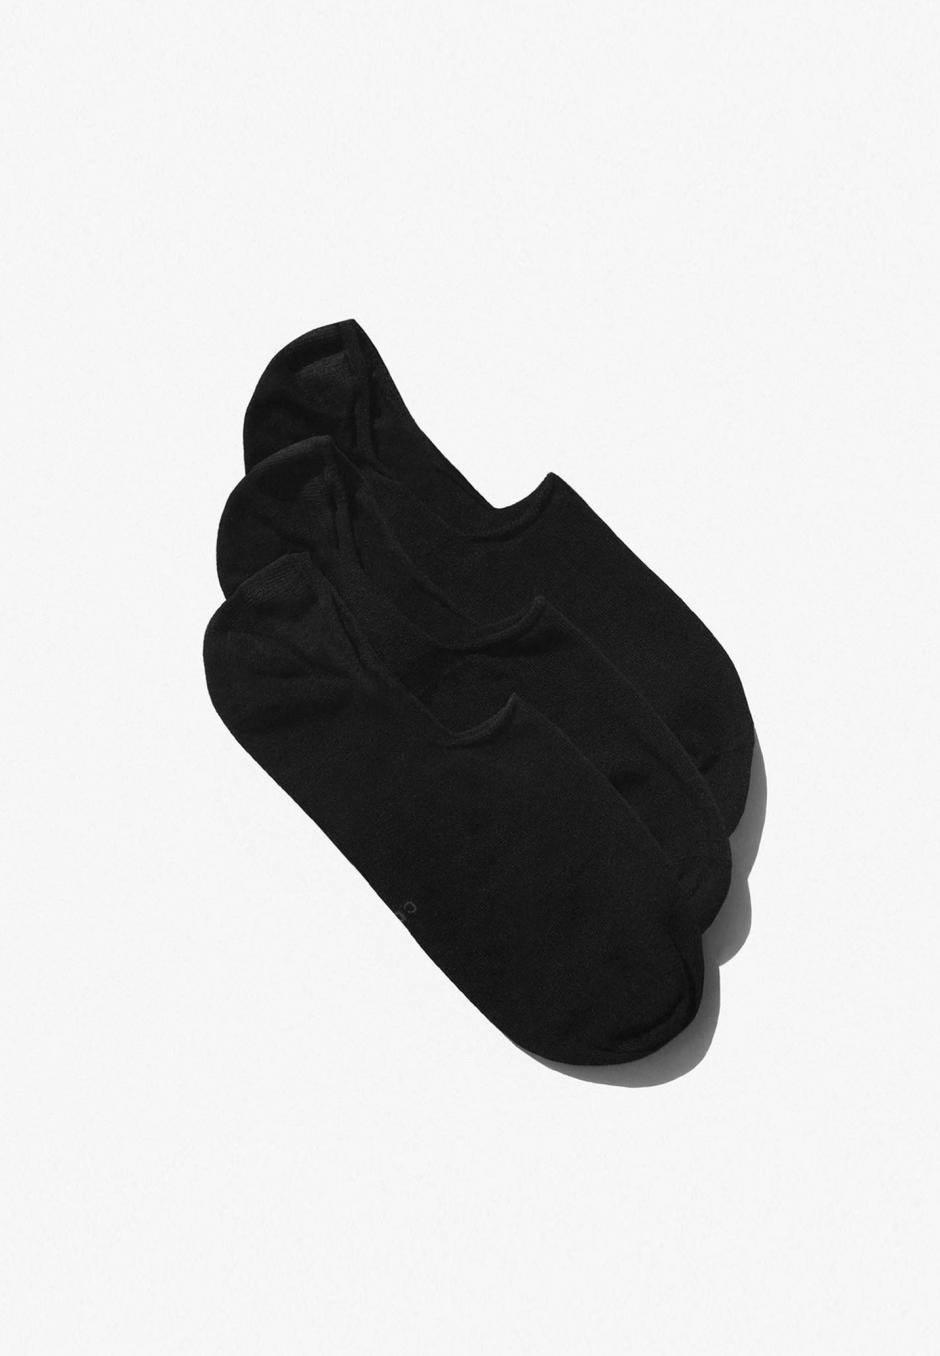 CDLP Low-Cut Socks 3-pack